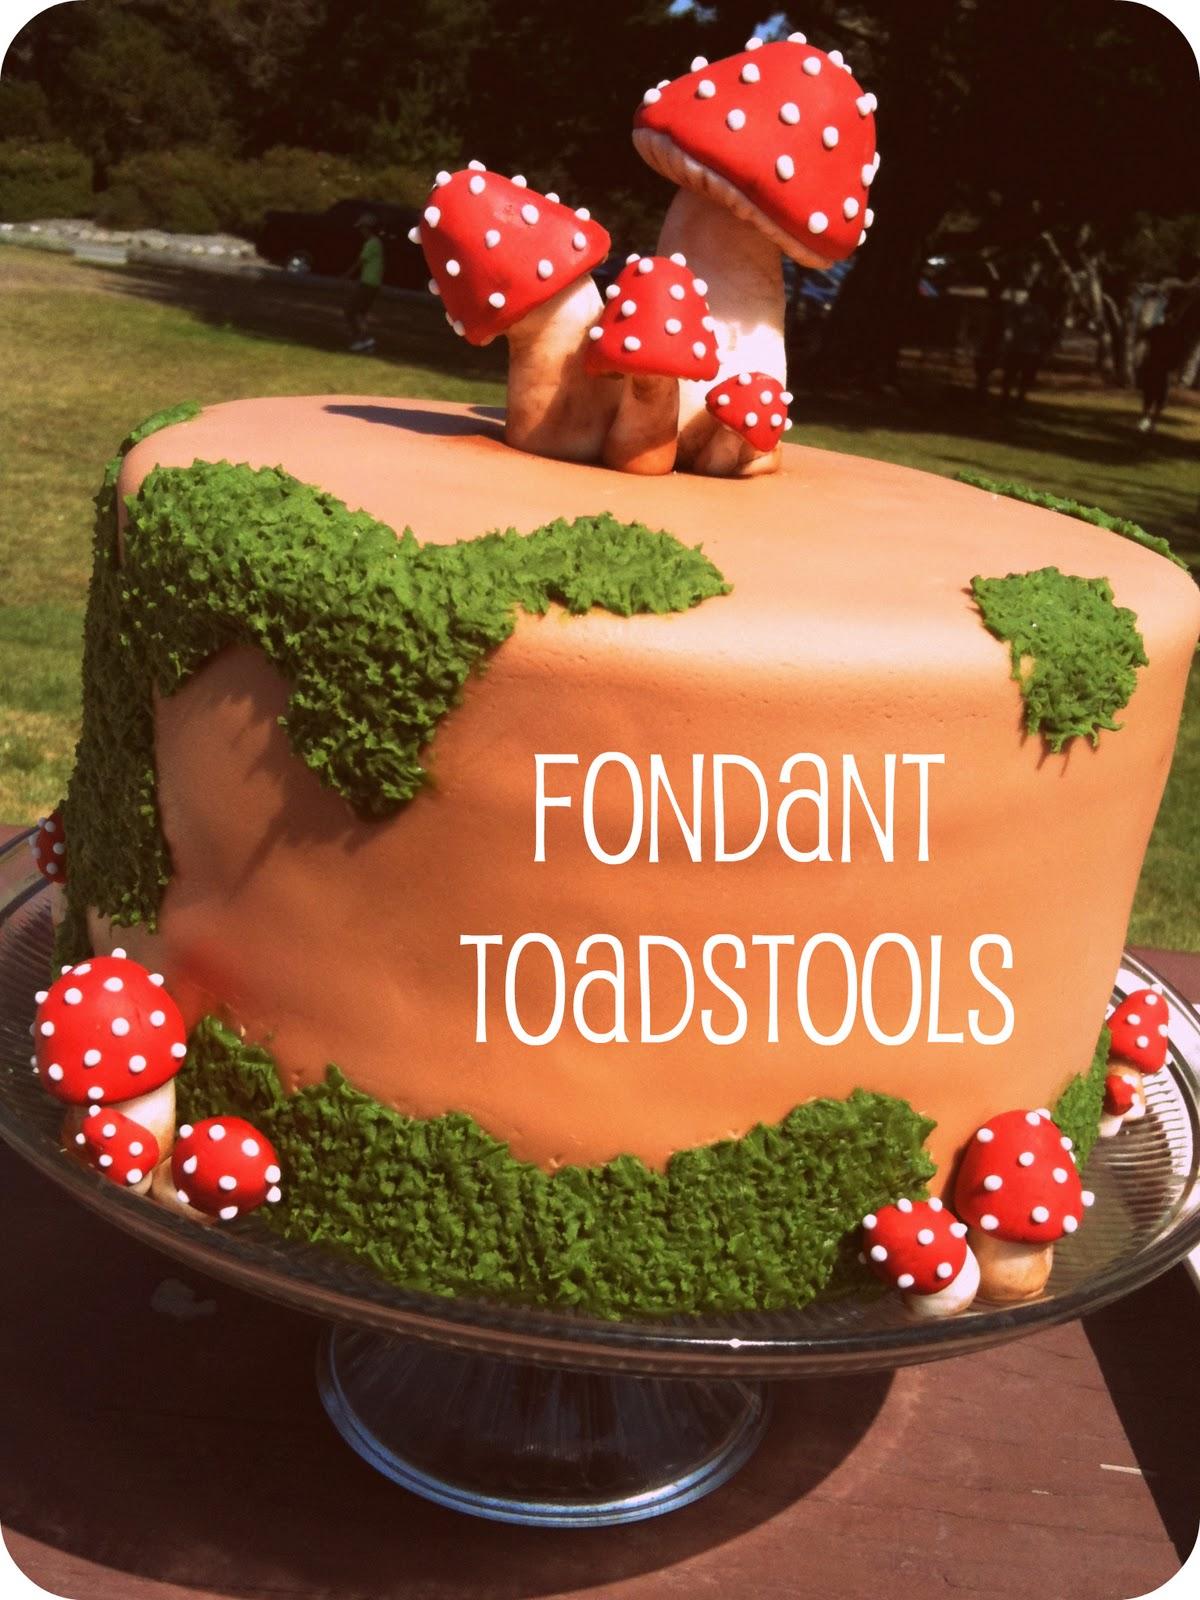 Fondant Tutorial Woodland Toadstools & Jennuine by Rook No. 17*: Fondant Tutorial: Woodland Toadstools islam-shia.org